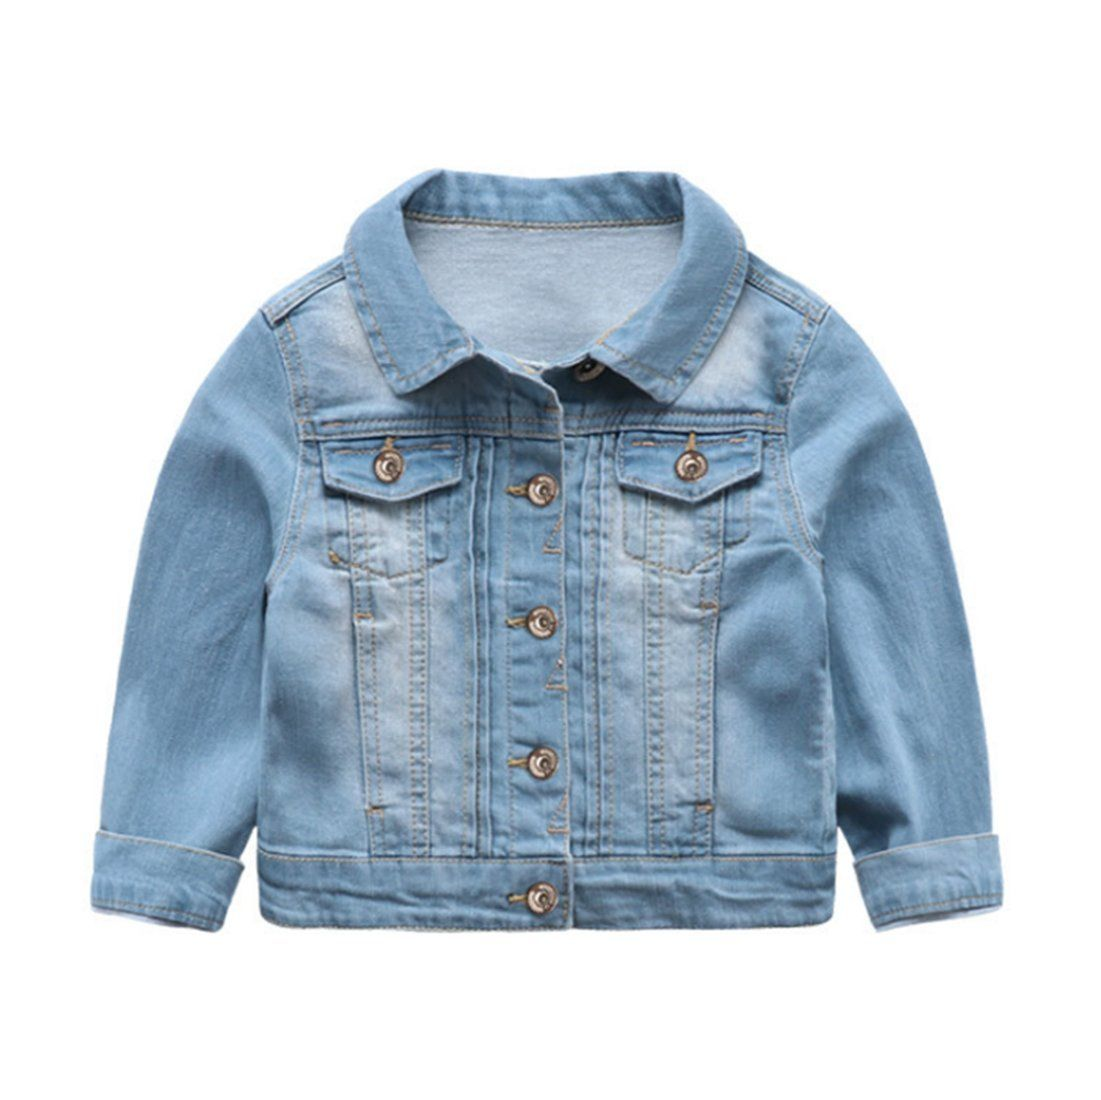 40959c12b Winzik Little Boys Kids Outfits Spring Autumn Lapel Long Sleeve ...